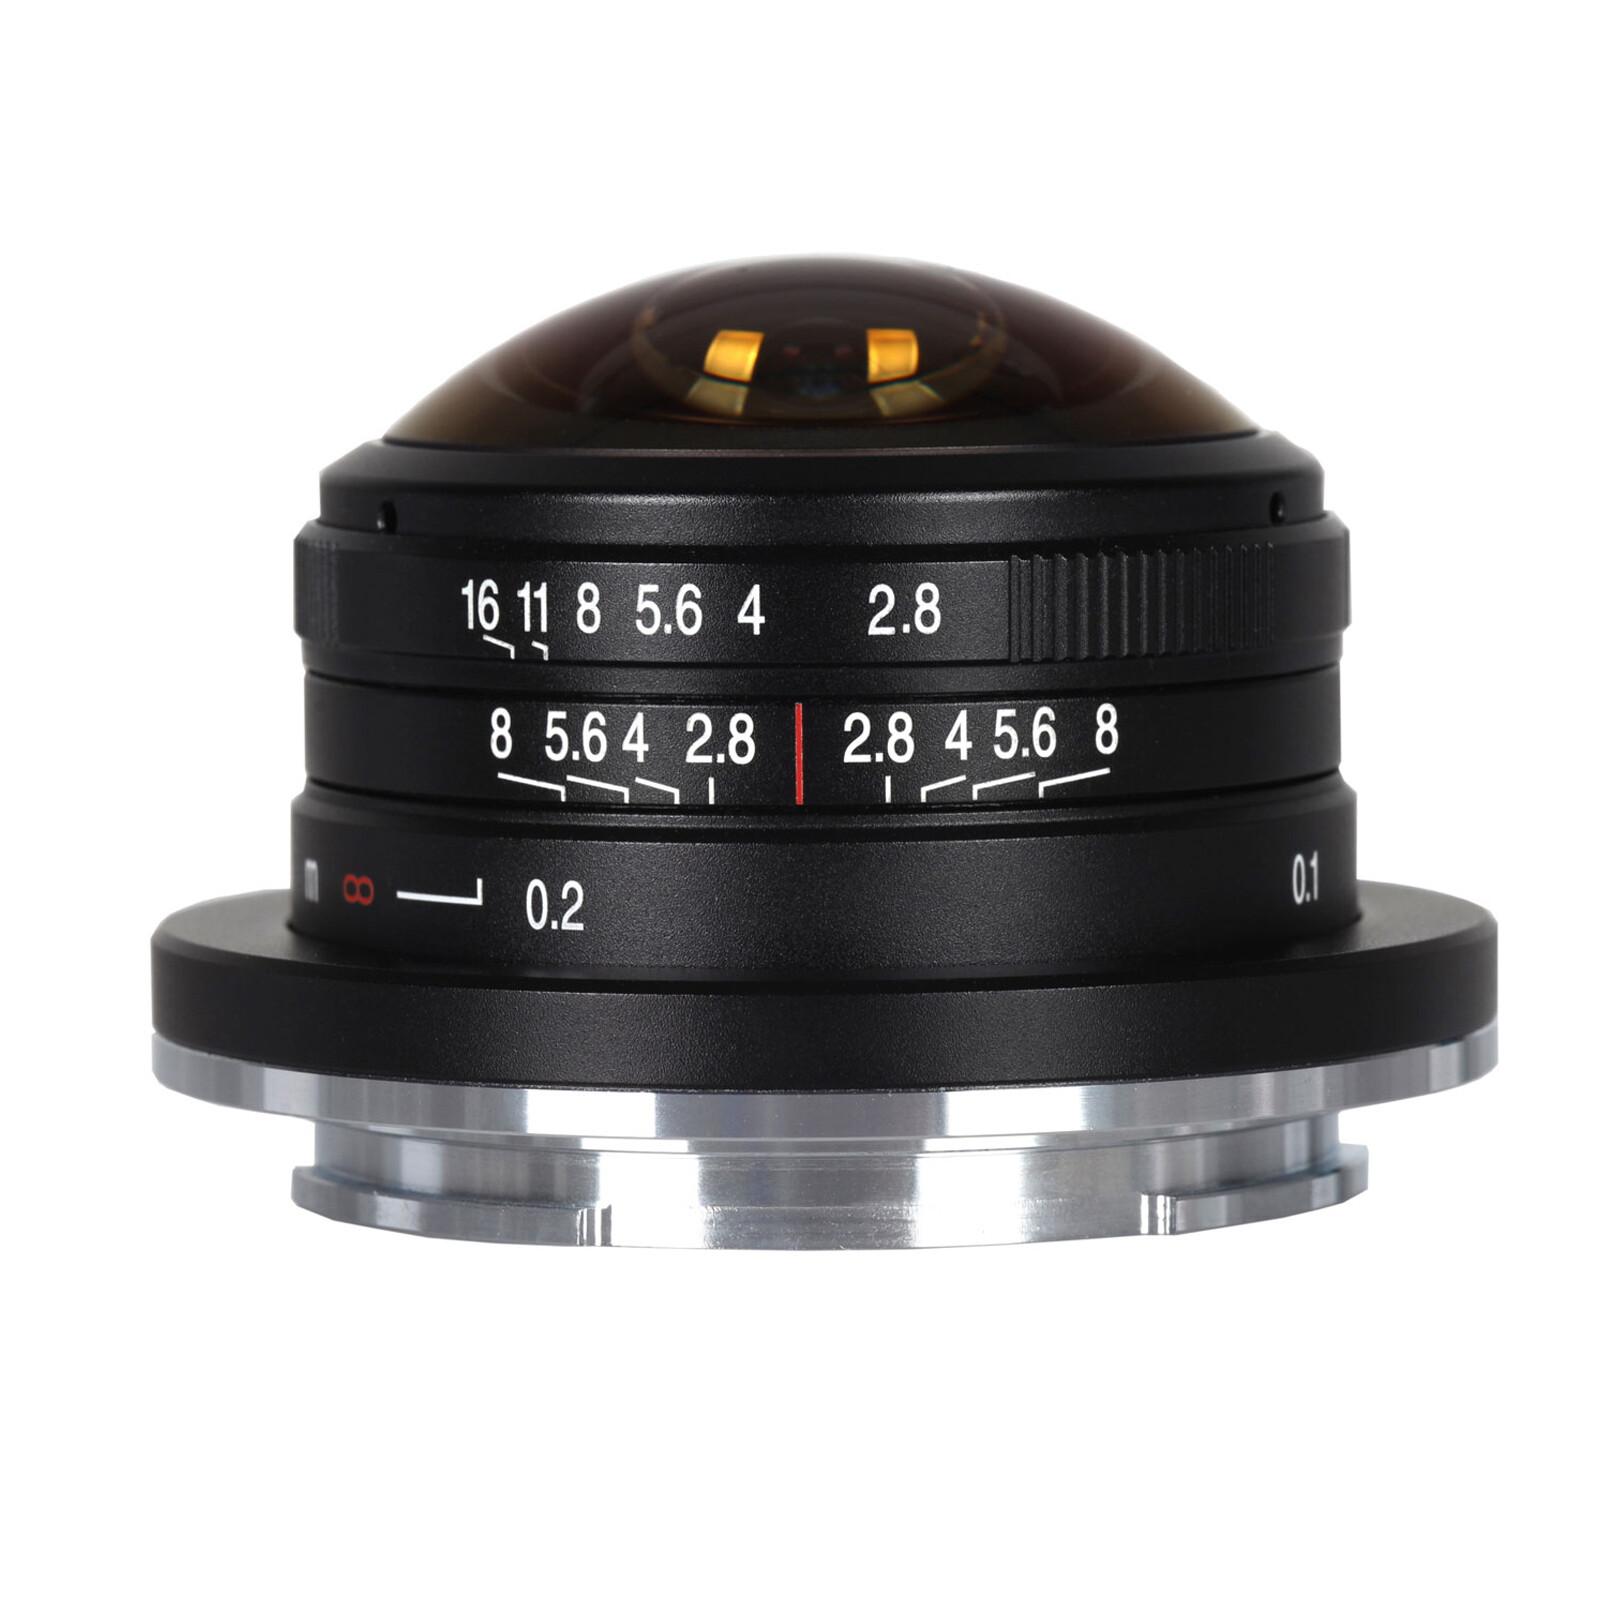 LAOWA 4/2,8 Circular Fisheye Sony E